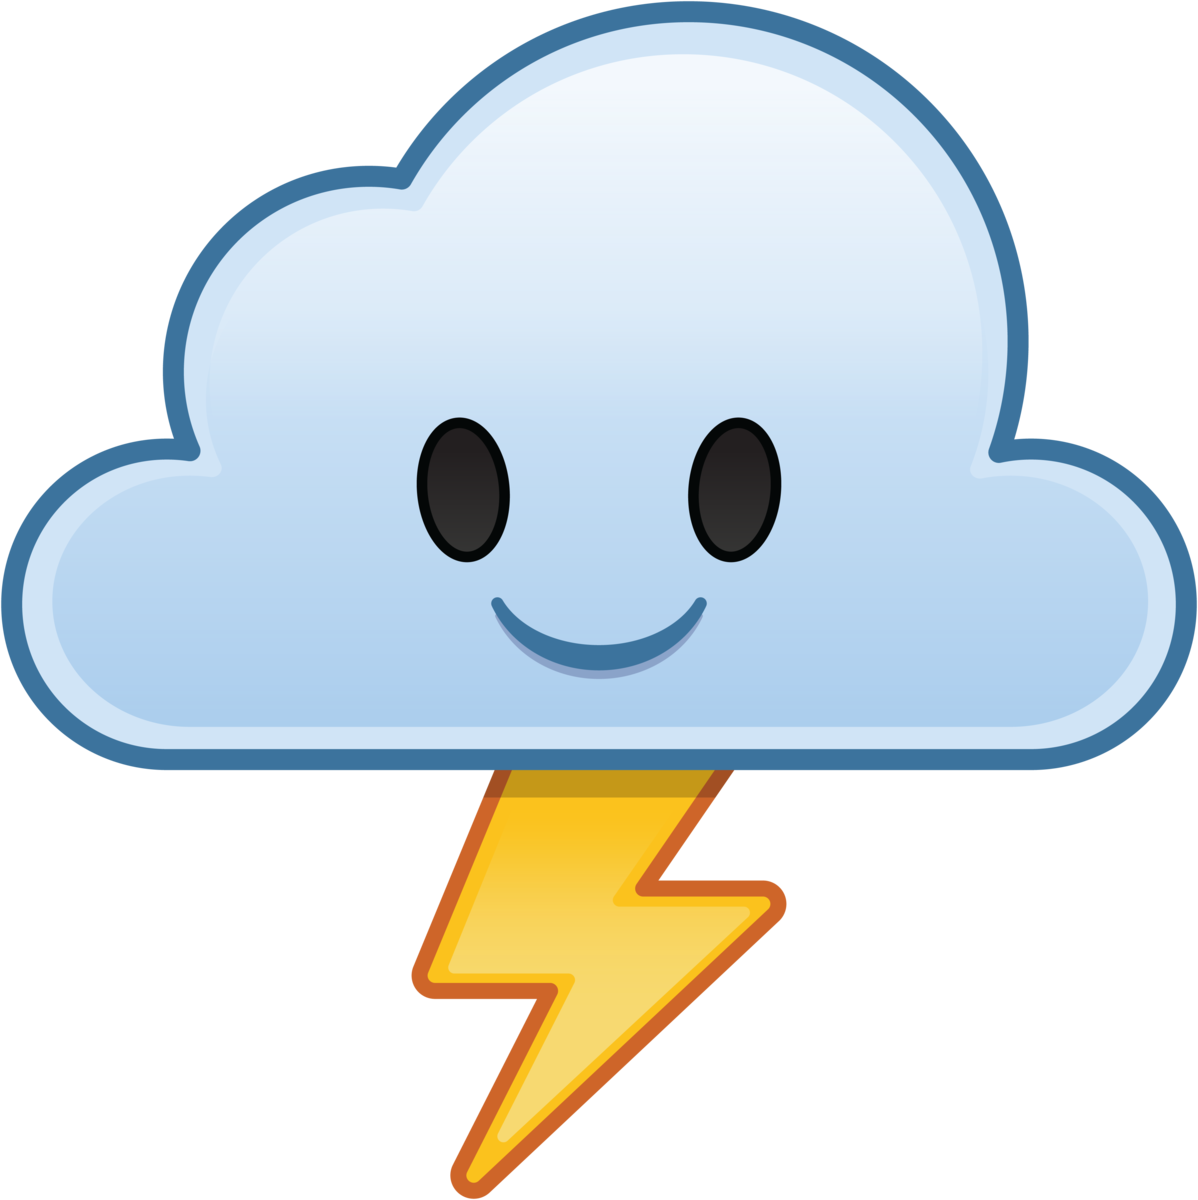 Lightning clipart emoji. Cars team event disney